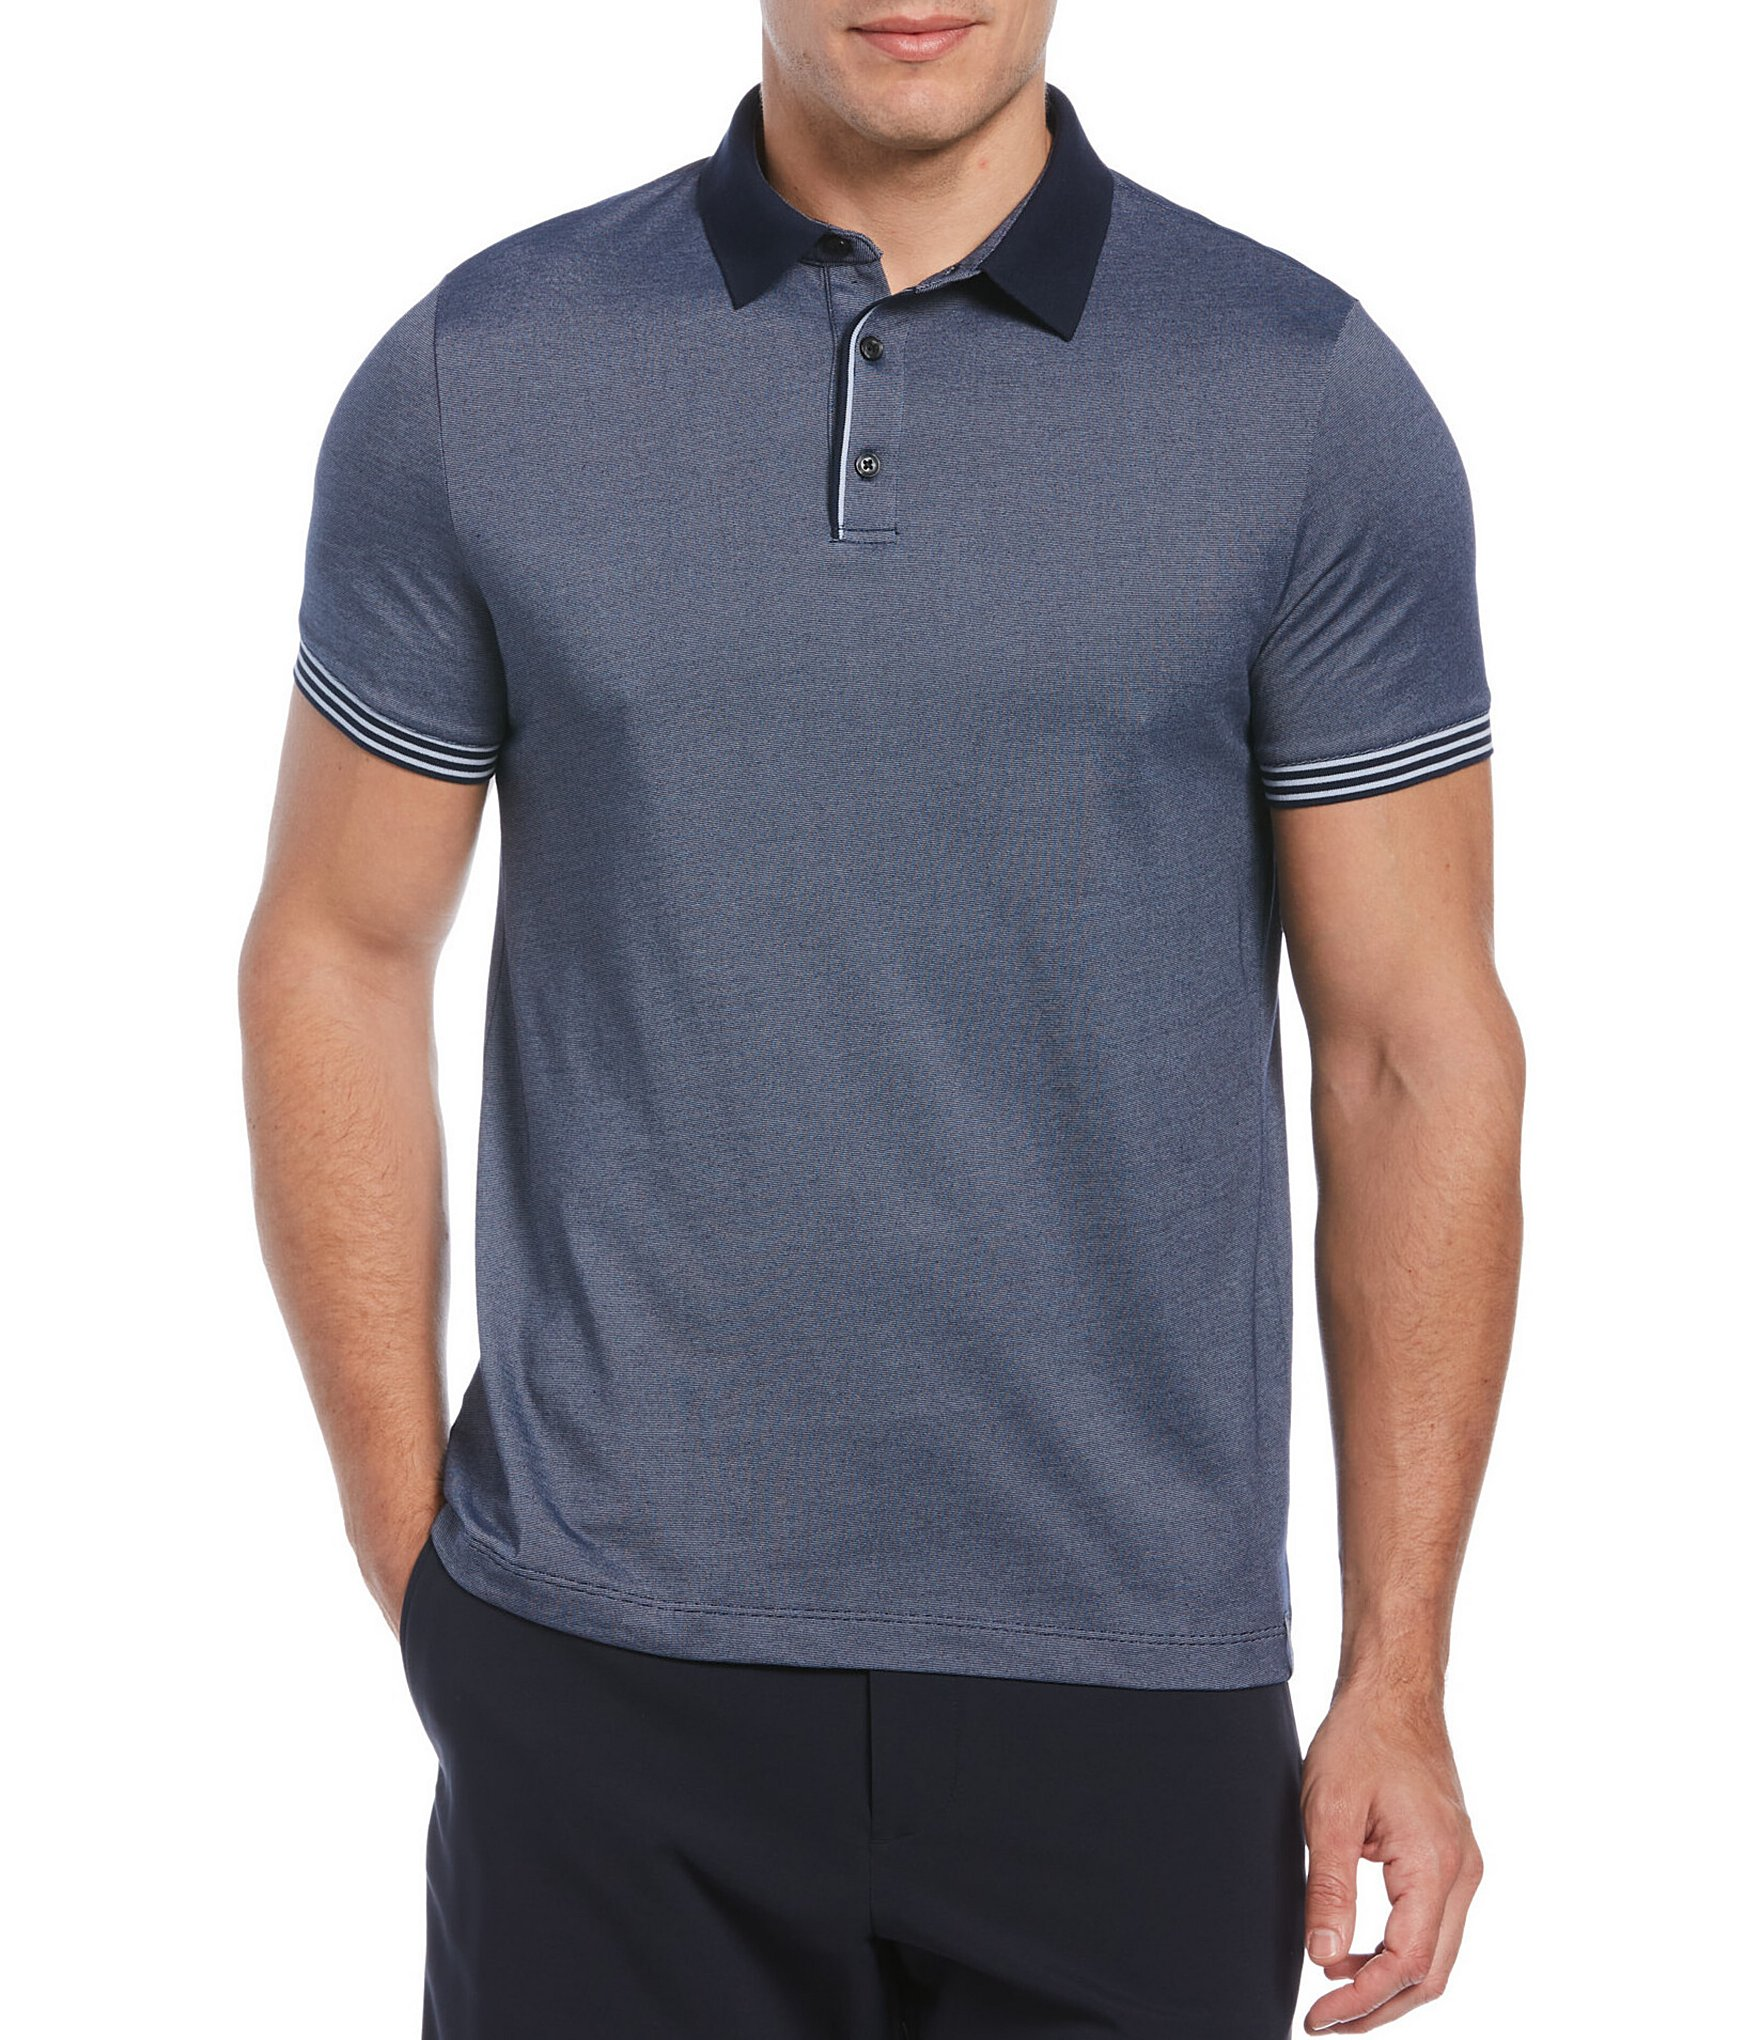 Perry Ellis #9490 NEW Men/'s Big /& Tall Short Sleeve Polo Shirt MSRP $69.50